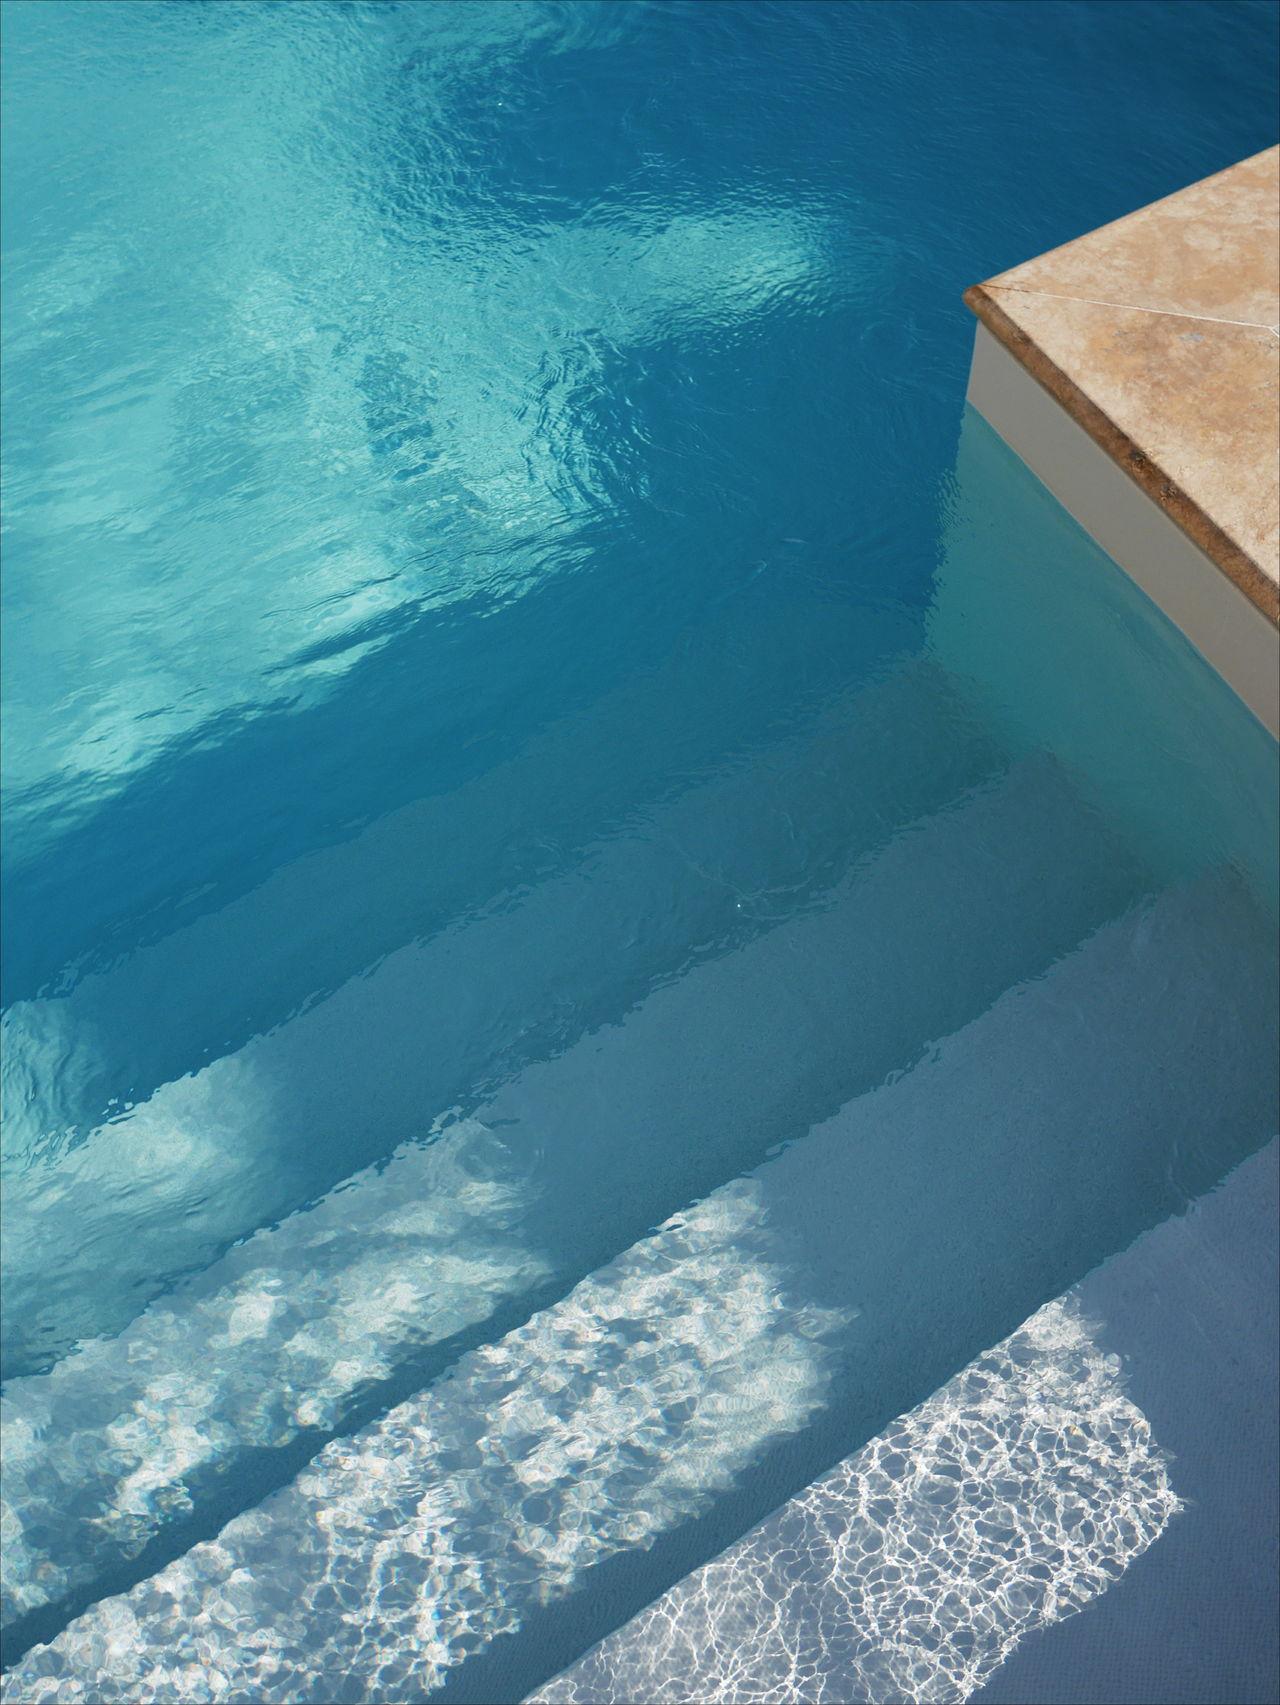 minimal minimalism swimming pool water outdoors full frame blue pool Stairs